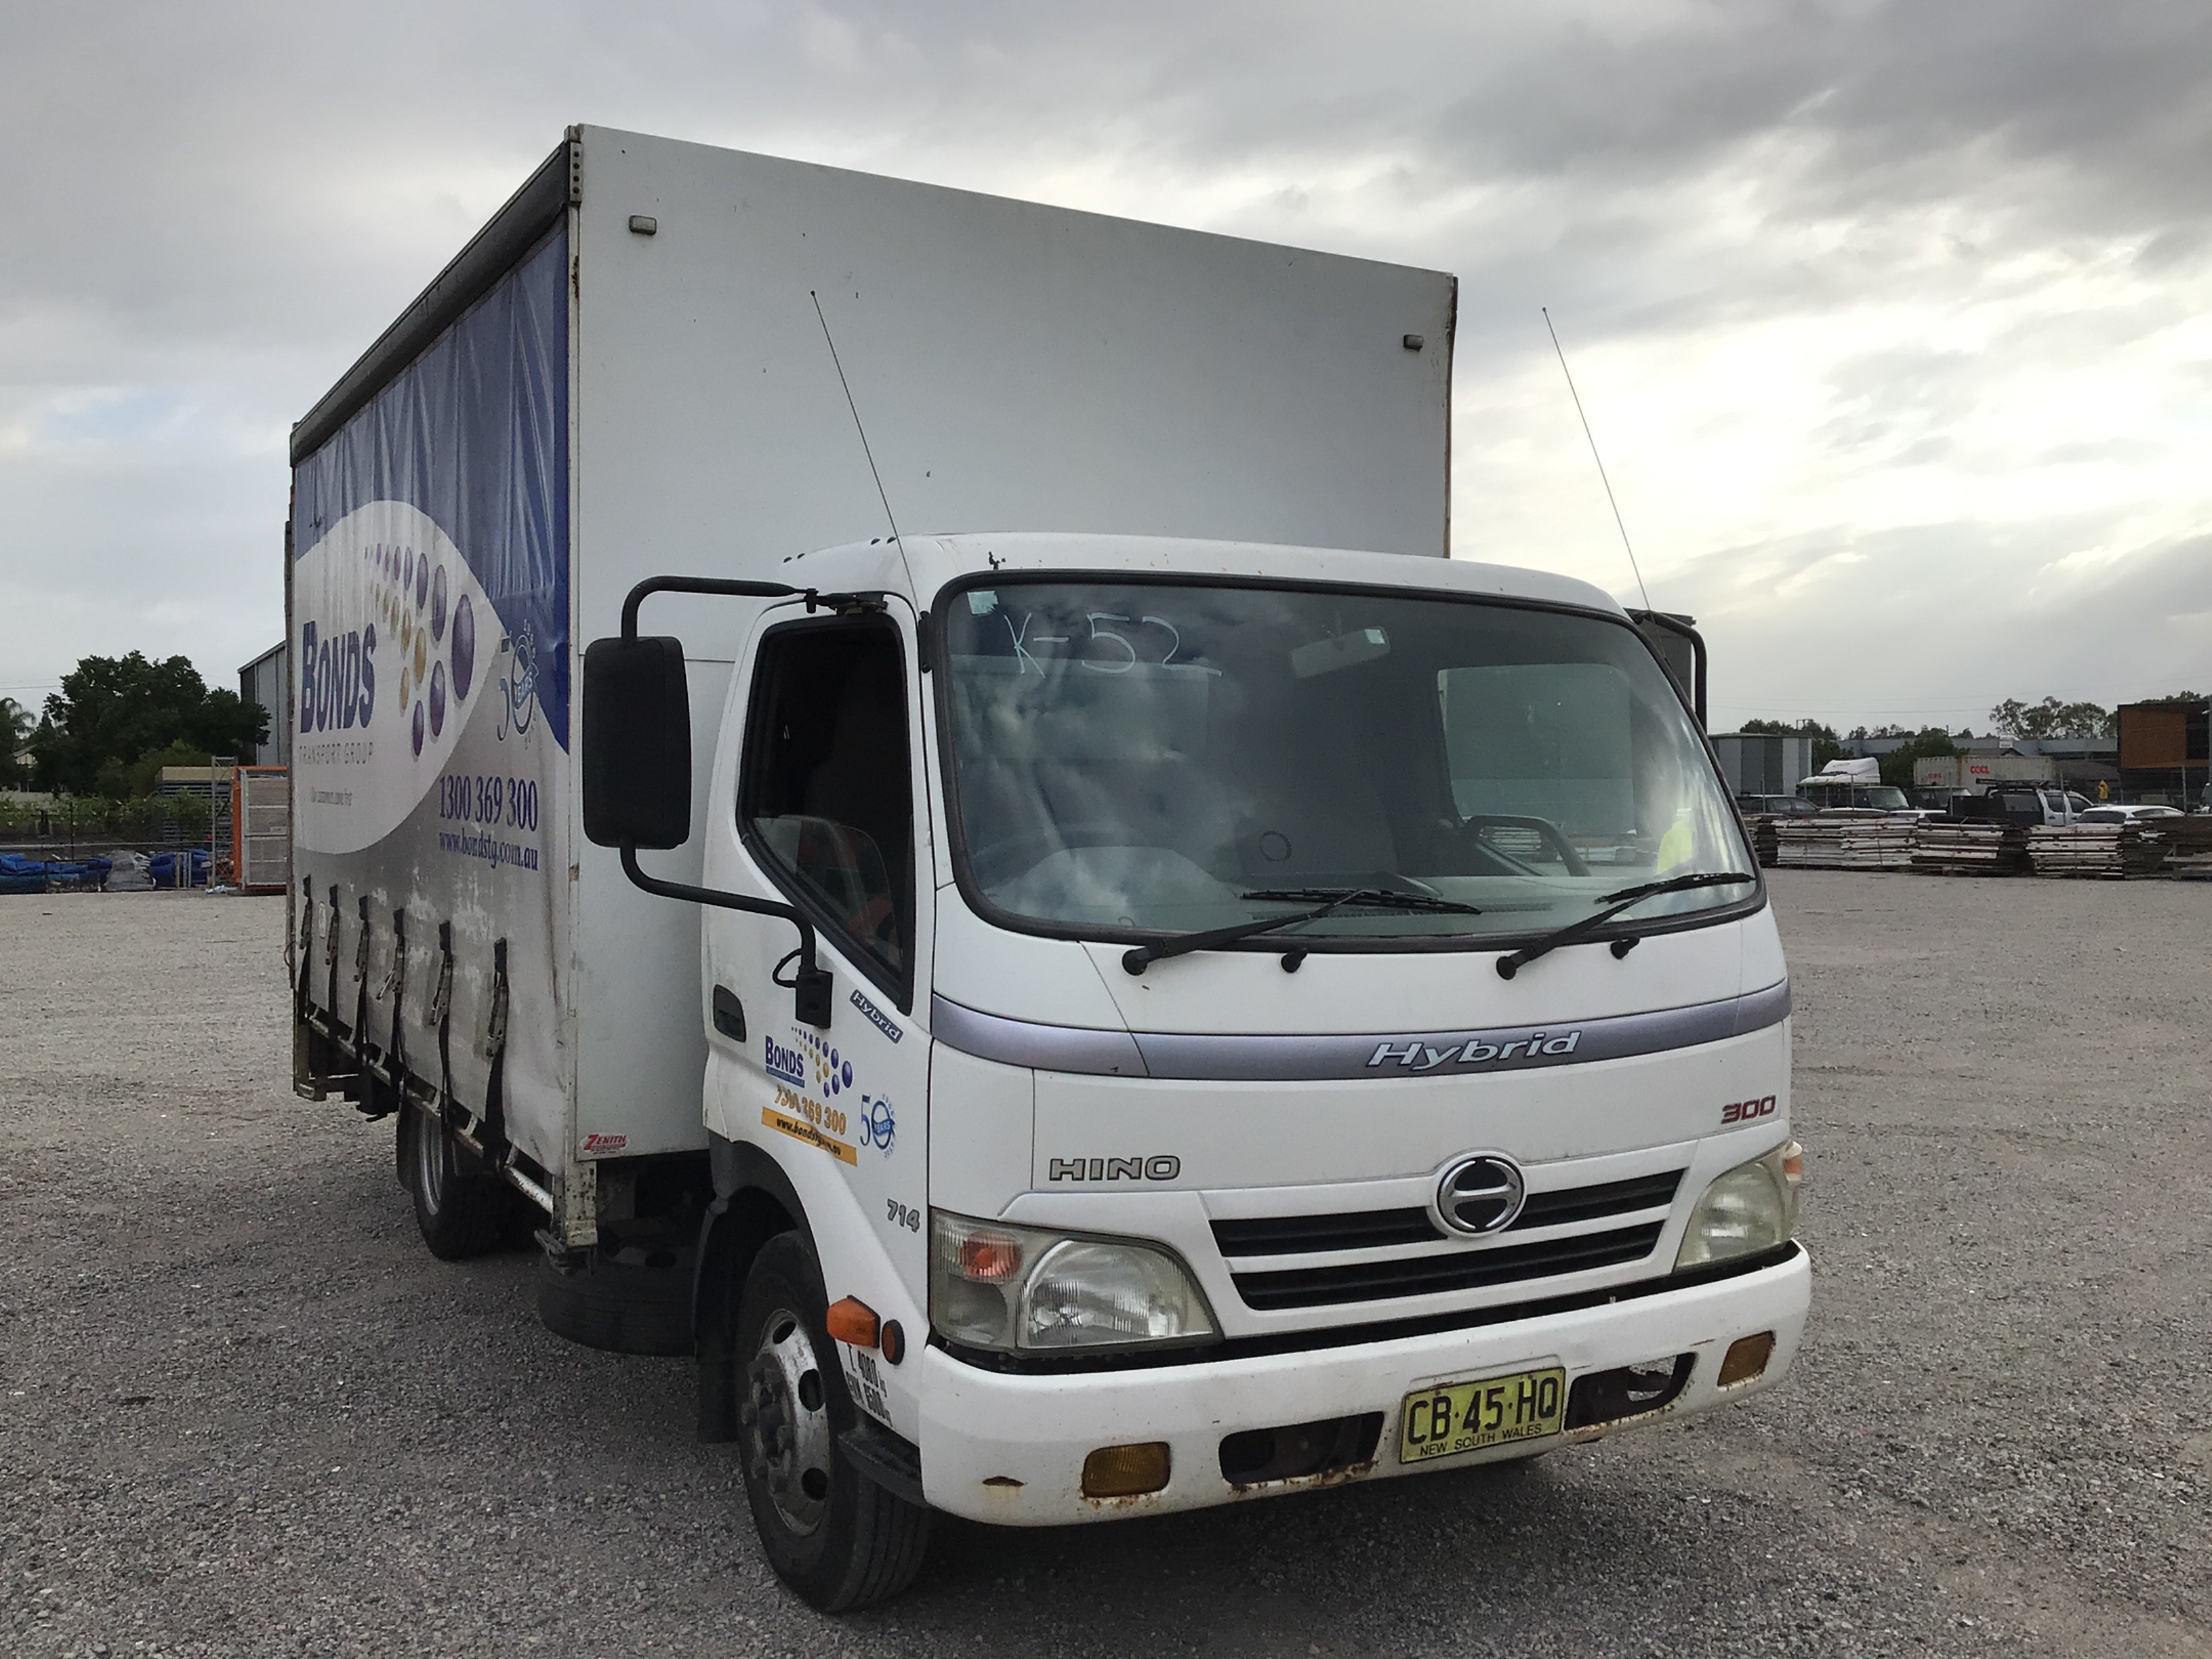 2010 Hino Hybrid 300 4 x 2 Curtainsider Rigid Truck